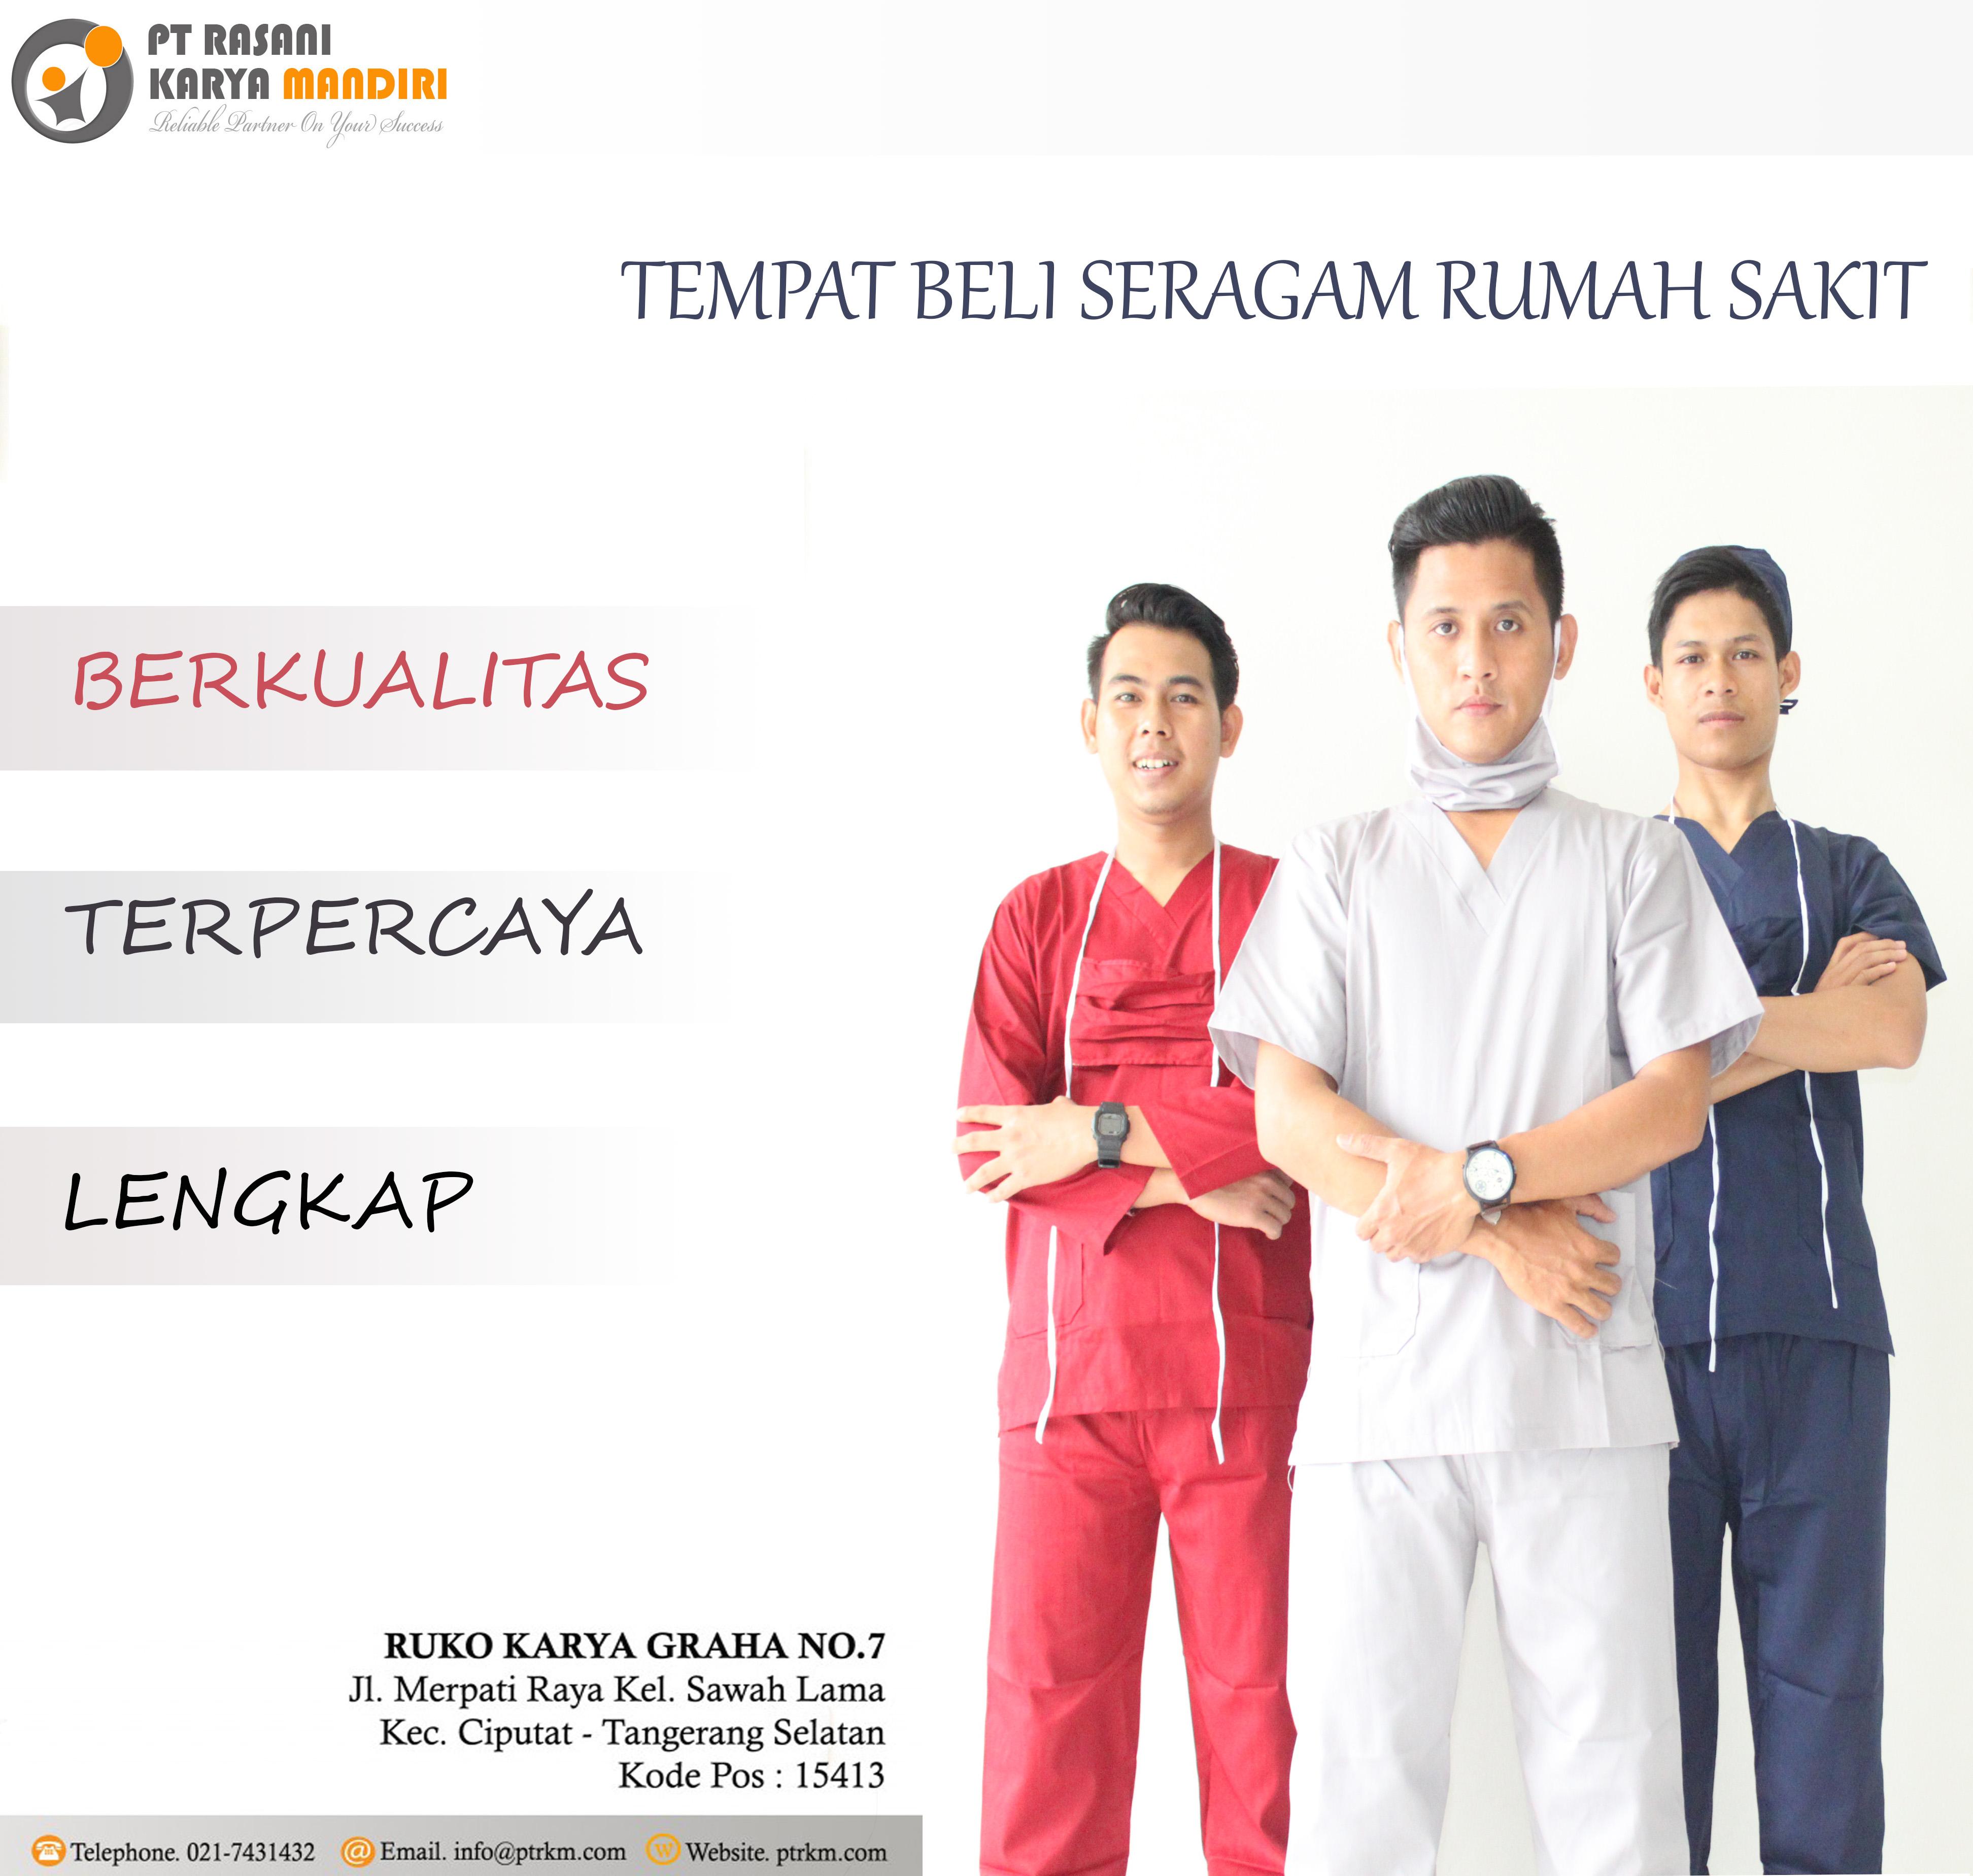 Baju Operasi Wanita, Kenapa Baju Operasi Warnanya Hijau, Baju Operasi Pdrm 2015, Baju Perawat, Baju Perawat Anak, Baju Perawat Lengan Panjang, Baju Perawat Putih, Baju Perawat Pria, Baju Perawat Wanita, Baju Perawat Cowok, Baju Perawat Rumah Sakit, Baju Perawat Hamil, Baju Perawat Berhijab, Baju Perawat Muslim, Baju Perawat Anak2, Baju Perawat Untuk Anak, Model Baju Perawat Anak, Gambar Baju Perawat Anak, Harga Baju Perawat Anak, Contoh Baju Perawat Anak, Desain Baju Perawat Anak, Baju Profesi Anak Perawat, Model Baju Atasan Perawat, Baju Perawat Berjilbab, Baju Perawat Bandung, Baju Perawat Bedah, Baju Hamil Perawat, Baju Batik Perawat, Baju Blazer Perawat, Model Baju Perawat Berjilbab, Baju Seragam Perawat Berjilbab, Jual Baju Perawat Bandung, Baju Perawat Cilik, Baju Perawat Cantik, Gambar Baju Perawat Cowok, Desain Baju Perawat Cowok, Baju Perawat Kerah Cina, Baju Perawat Untuk Karnaval Jaman Dulu, Baju Perawat Rumah Sakit Cikini, Contoh Baju Perawat Rumah Sakit, Cari Baju Perawat, Baju Perawat Dewasa, Baju Perawat Dua Saudara, Baju Perawat Dress, Baju Perawat Di Jepang, Baju Dinas Perawat, Baju Dinas Perawat Modern, Baju Dinas Perawat Muslim, Baju Dinas Perawat Wanita, Baju Dinas Perawat Laki Laki, Baju Dinas Perawat Kombinasi,Foto Baju Perawat, Fungsi Baju Perawat, Baju Perawat Gigi, Model Baju Perawat Gigi, Baju Seragam Perawat Gigi, Gambar Baju Perawat, Grosir Baju Perawat, Gambar Baju Perawat Modern, Gambar Baju Perawat Terbaru, Gambar Baju Perawat Rumah Sakit, Gambar Baju Perawat Pria, Baju Perawat Hijab, Baju Perawat Baju Seragam Perawat Hamil, Gambar Baju Perawat Hamil, Baju Kerja Perawat Hamil, Jual Baju Perawat Hamil, Model Baju Perawat Hijab, Baju Perawat Warna Hijau, Gambar Baju Perawat Hijab, Baju Perawat Igd, Baju Perawat Indonesia, Baju Perawat Icu, Baju Perawat Ibu Hamil, Model Baju Perawat Igd, Model Baju Perawat Ibu Hamil, Jual Baju Perawat Icu, Model Baju Perawat Indonesia, Gambar Baju Perawat Igd, Baju Perawat Untuk Ibu Hamil, Baju Piket Pera